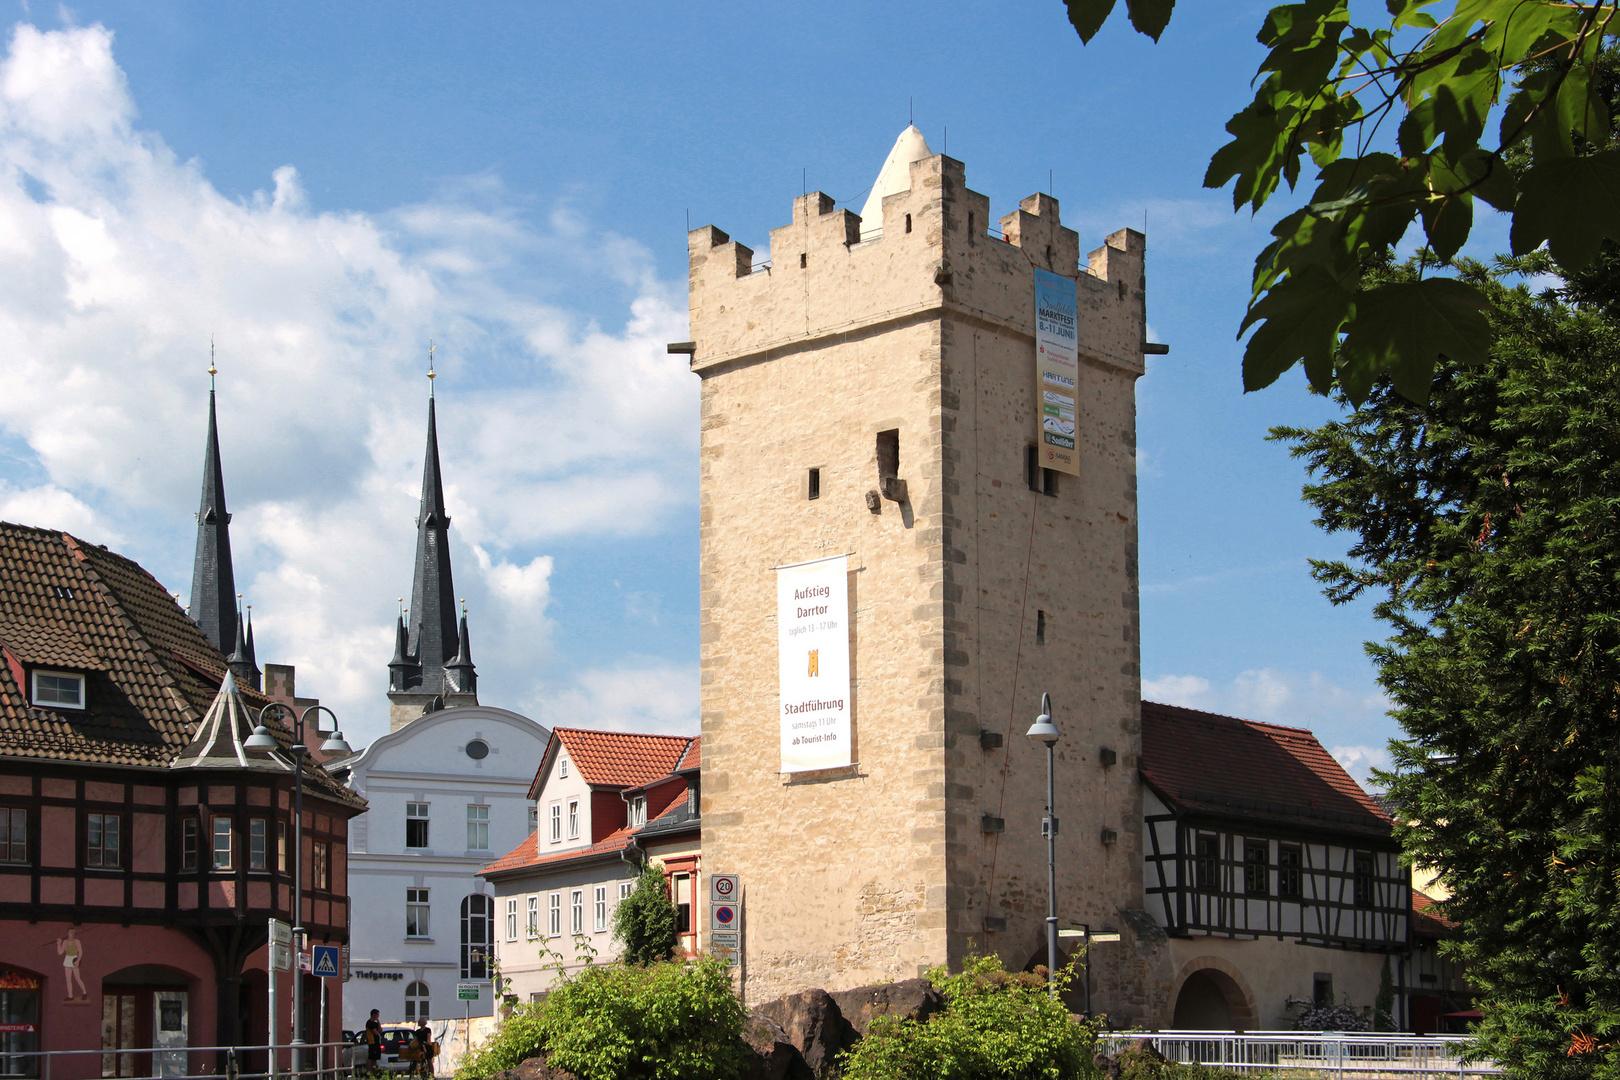 Spaziergang in Saalfeld (09) - Darrtor